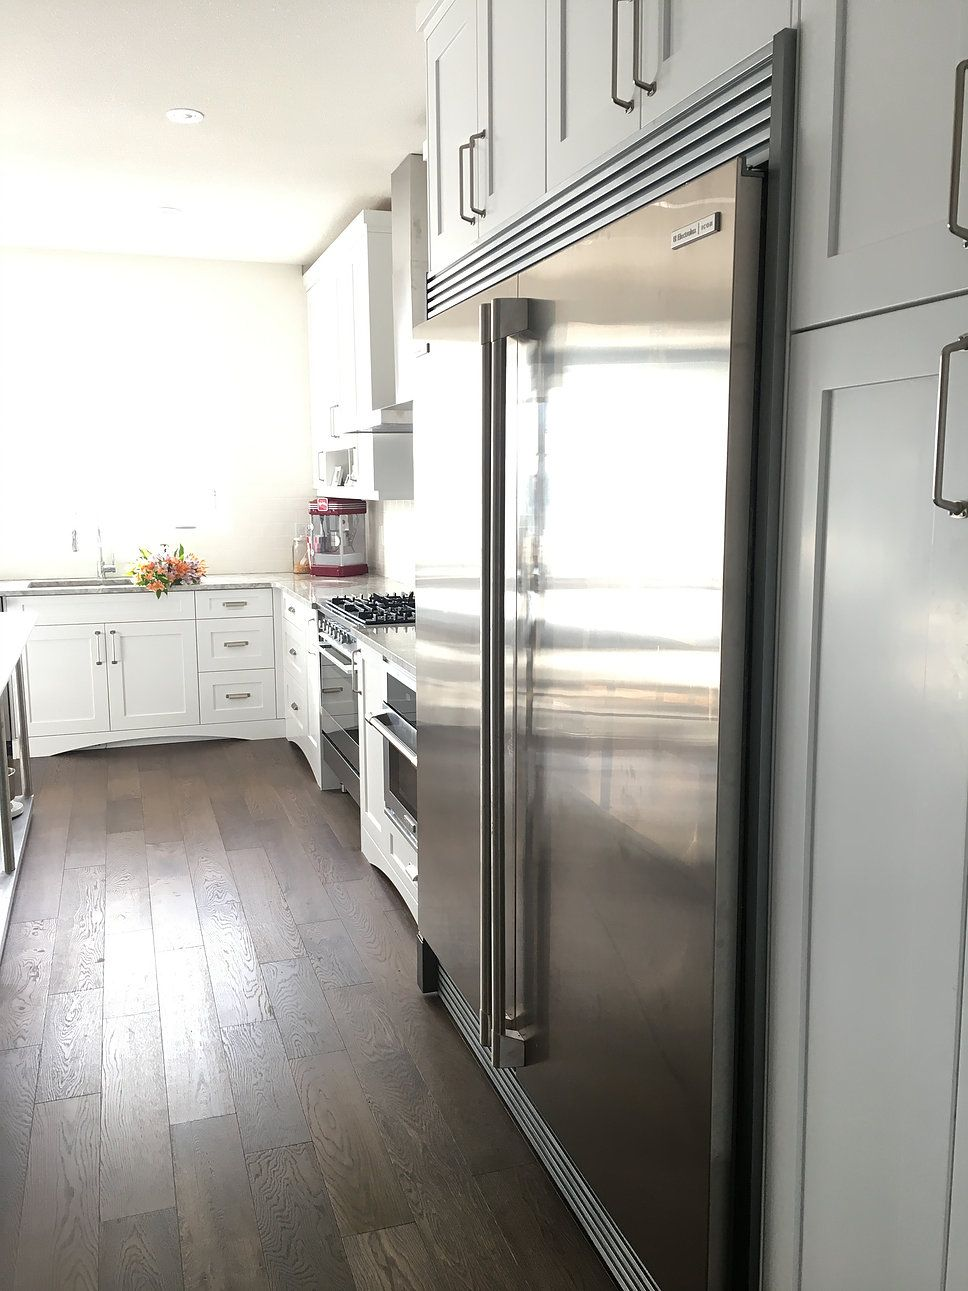 electrolux side by side fridge freezer with built in trim kit